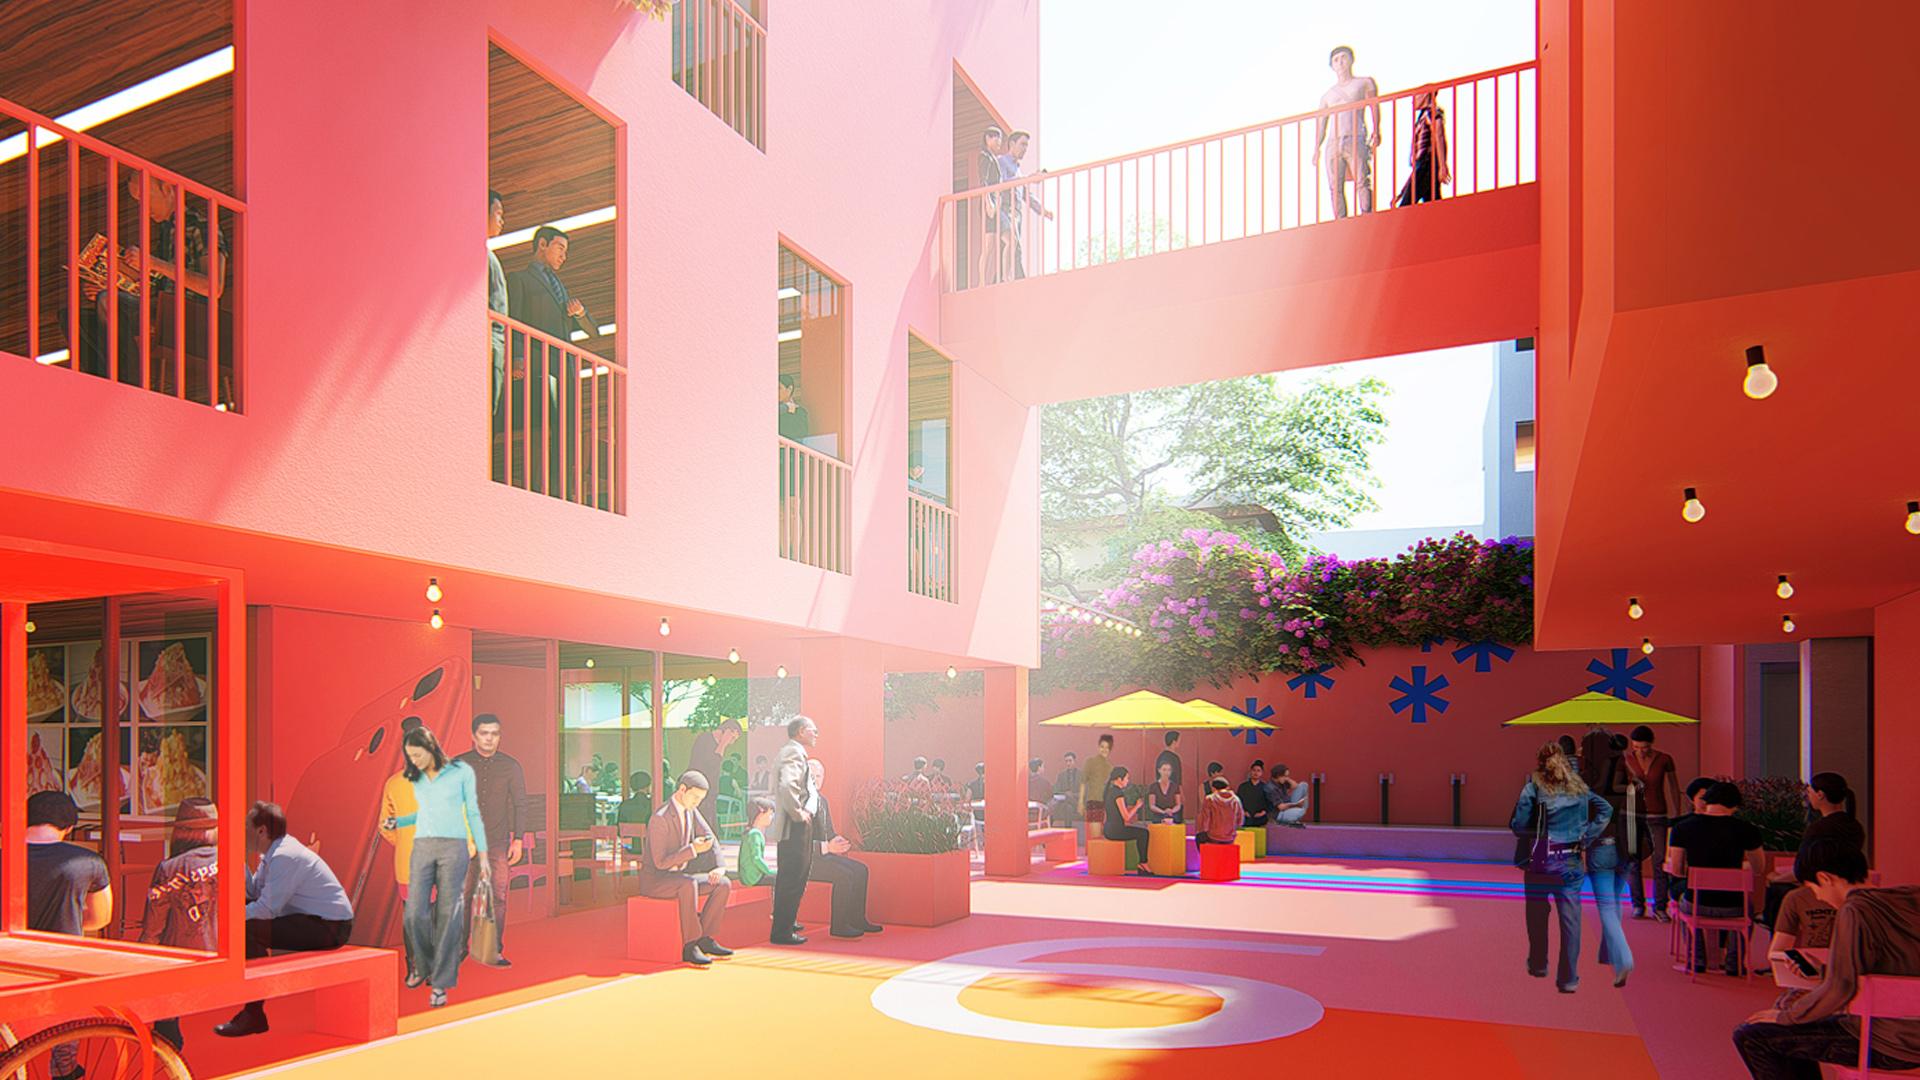 MAP Design_Architecture_Retail_Mixed_Use_Architect_Kiran_Mathema_Shopping_arcade_Courtyard